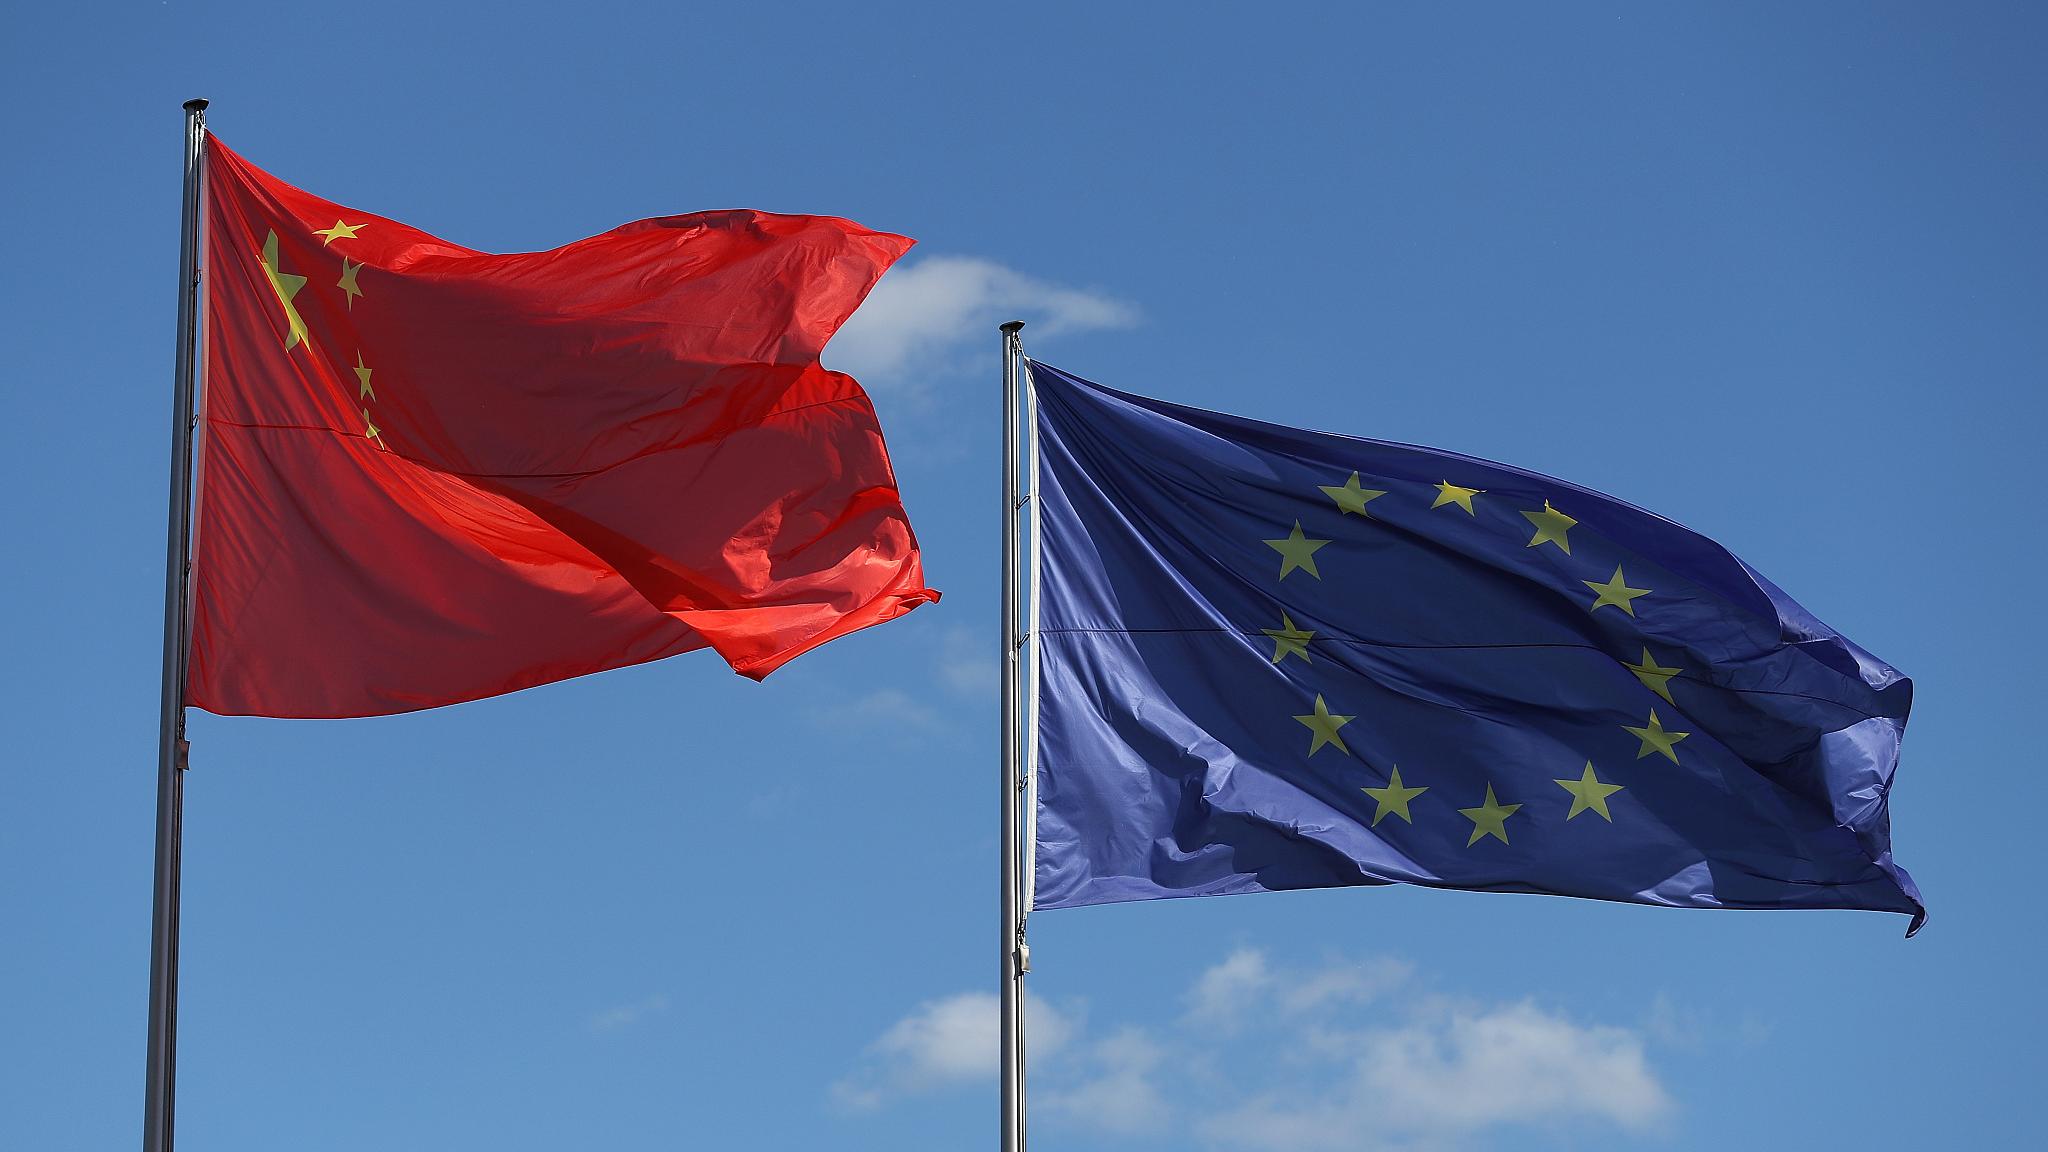 China highlights benefits of EU investment deal, hitting back at critics